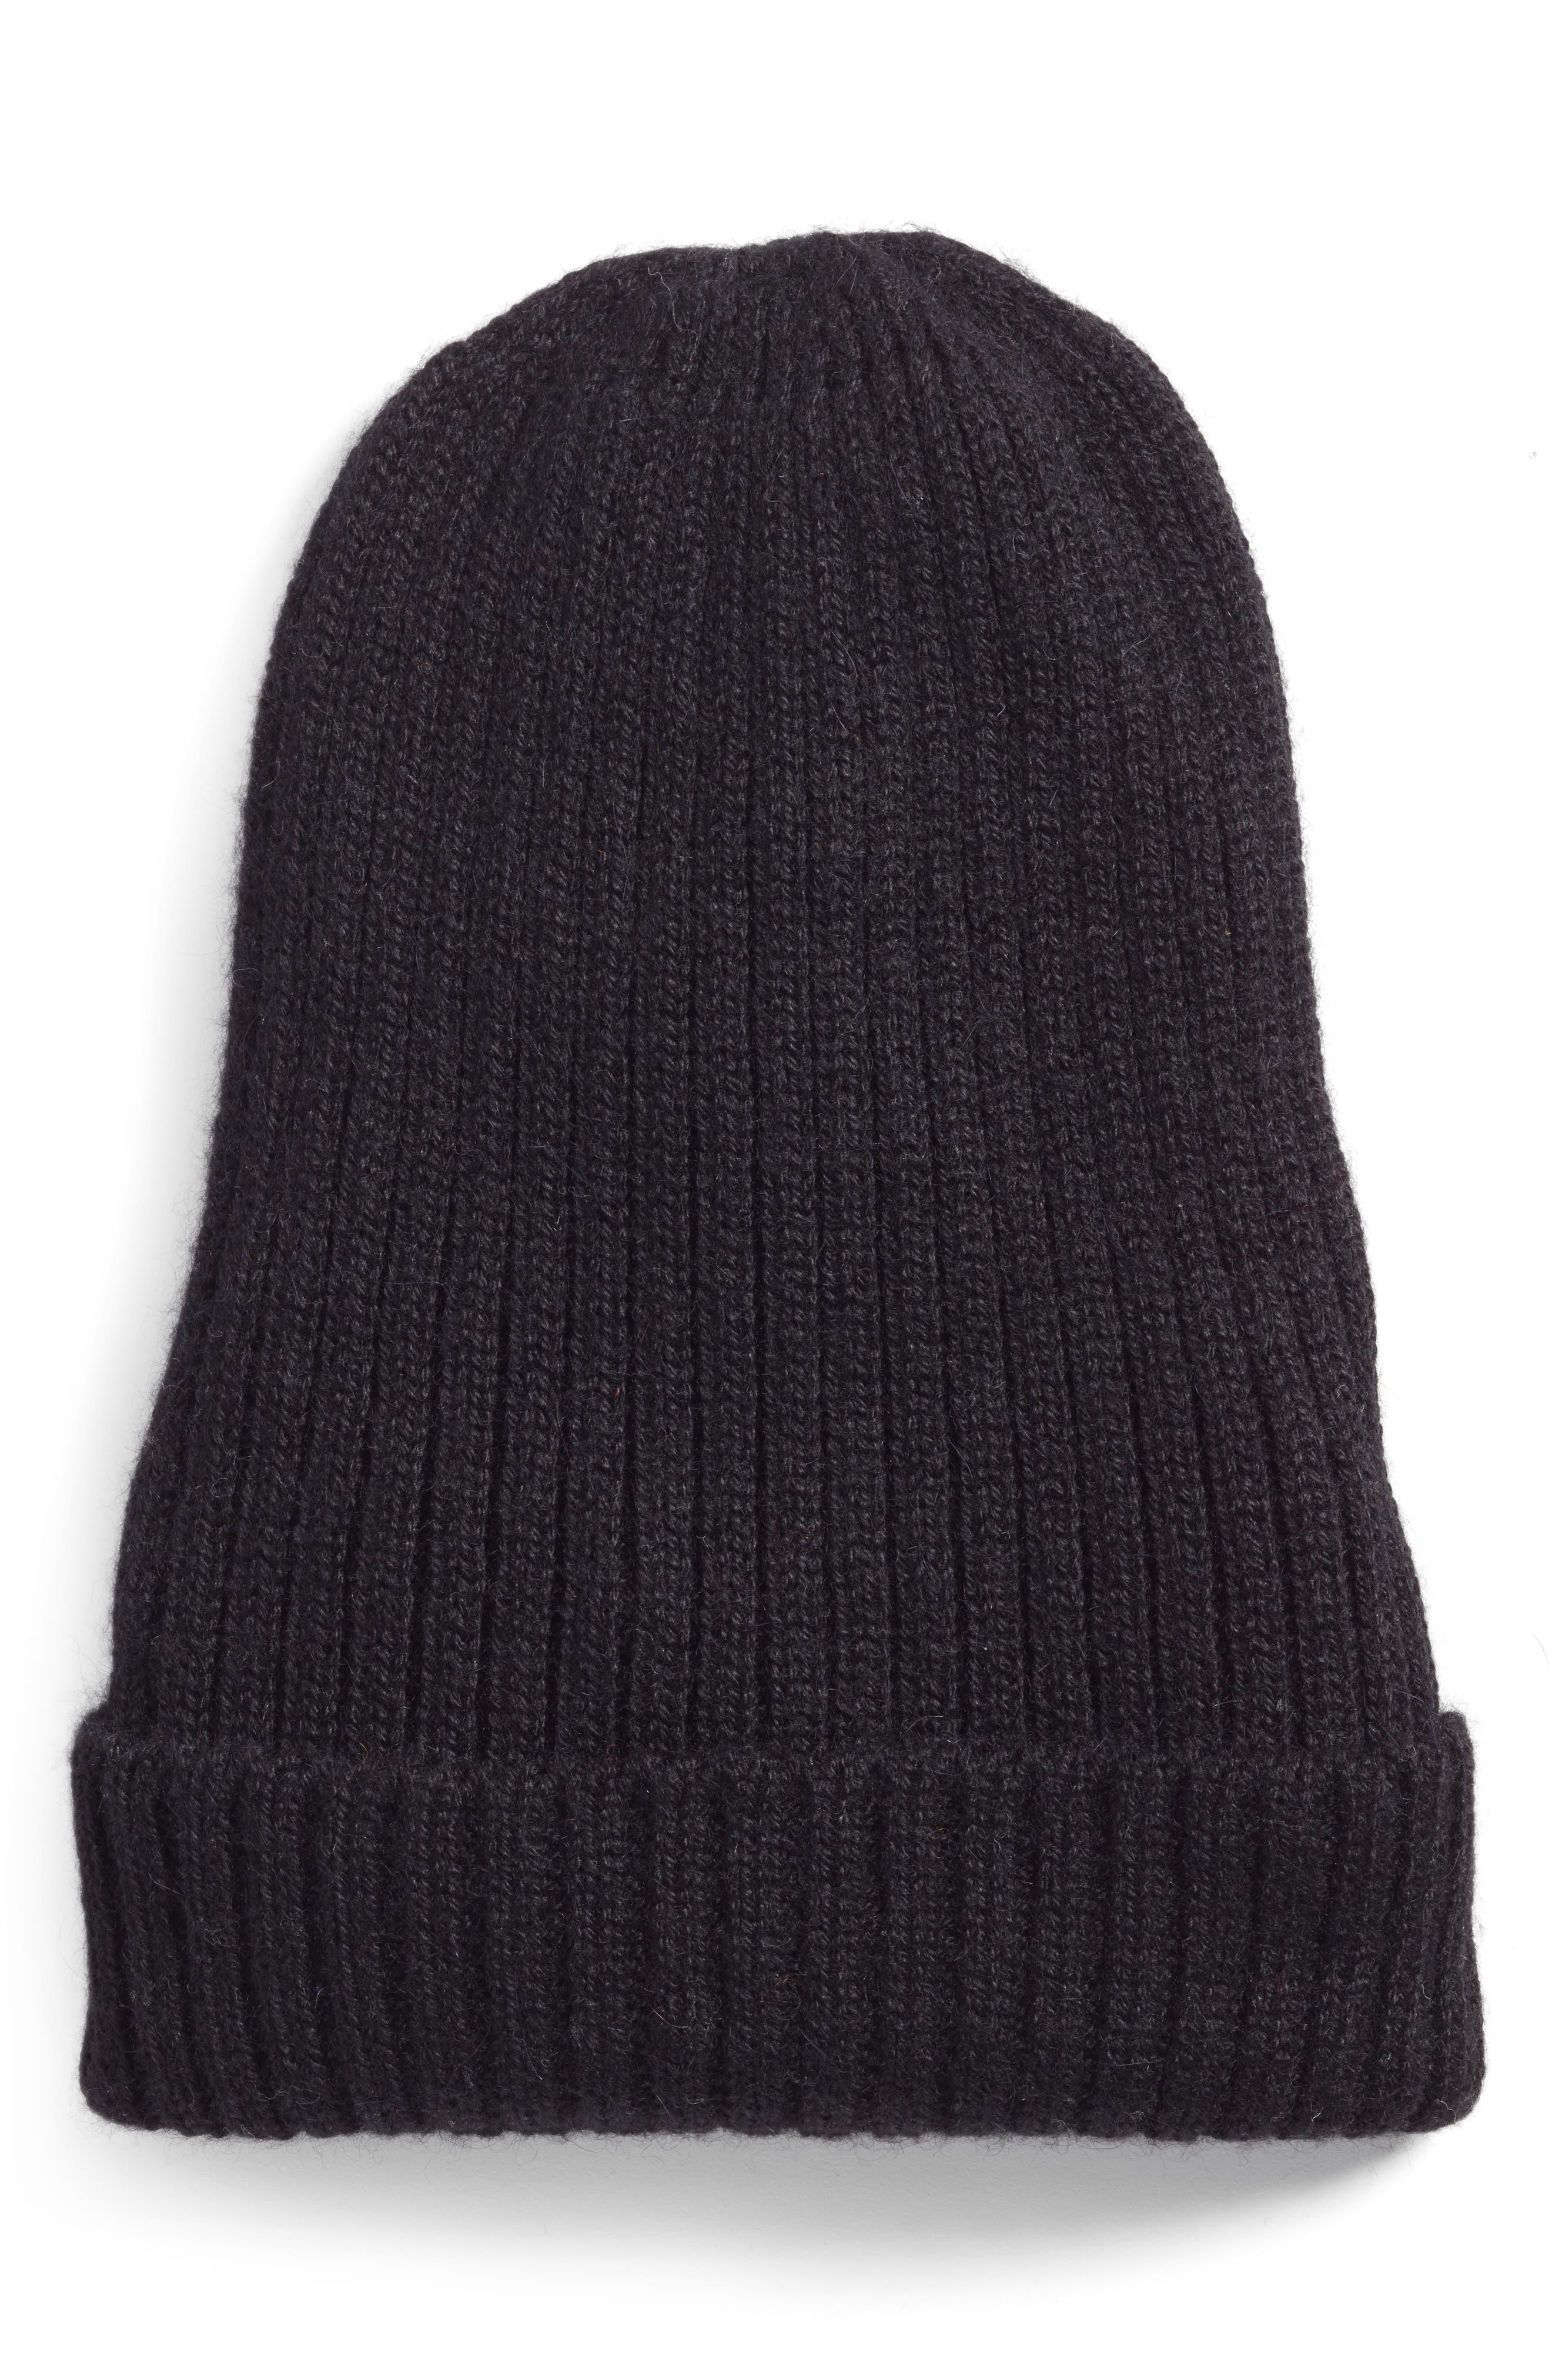 Nolita Alpaca Rib Knit Beanie,                             Main thumbnail 1, color,                             BLACK